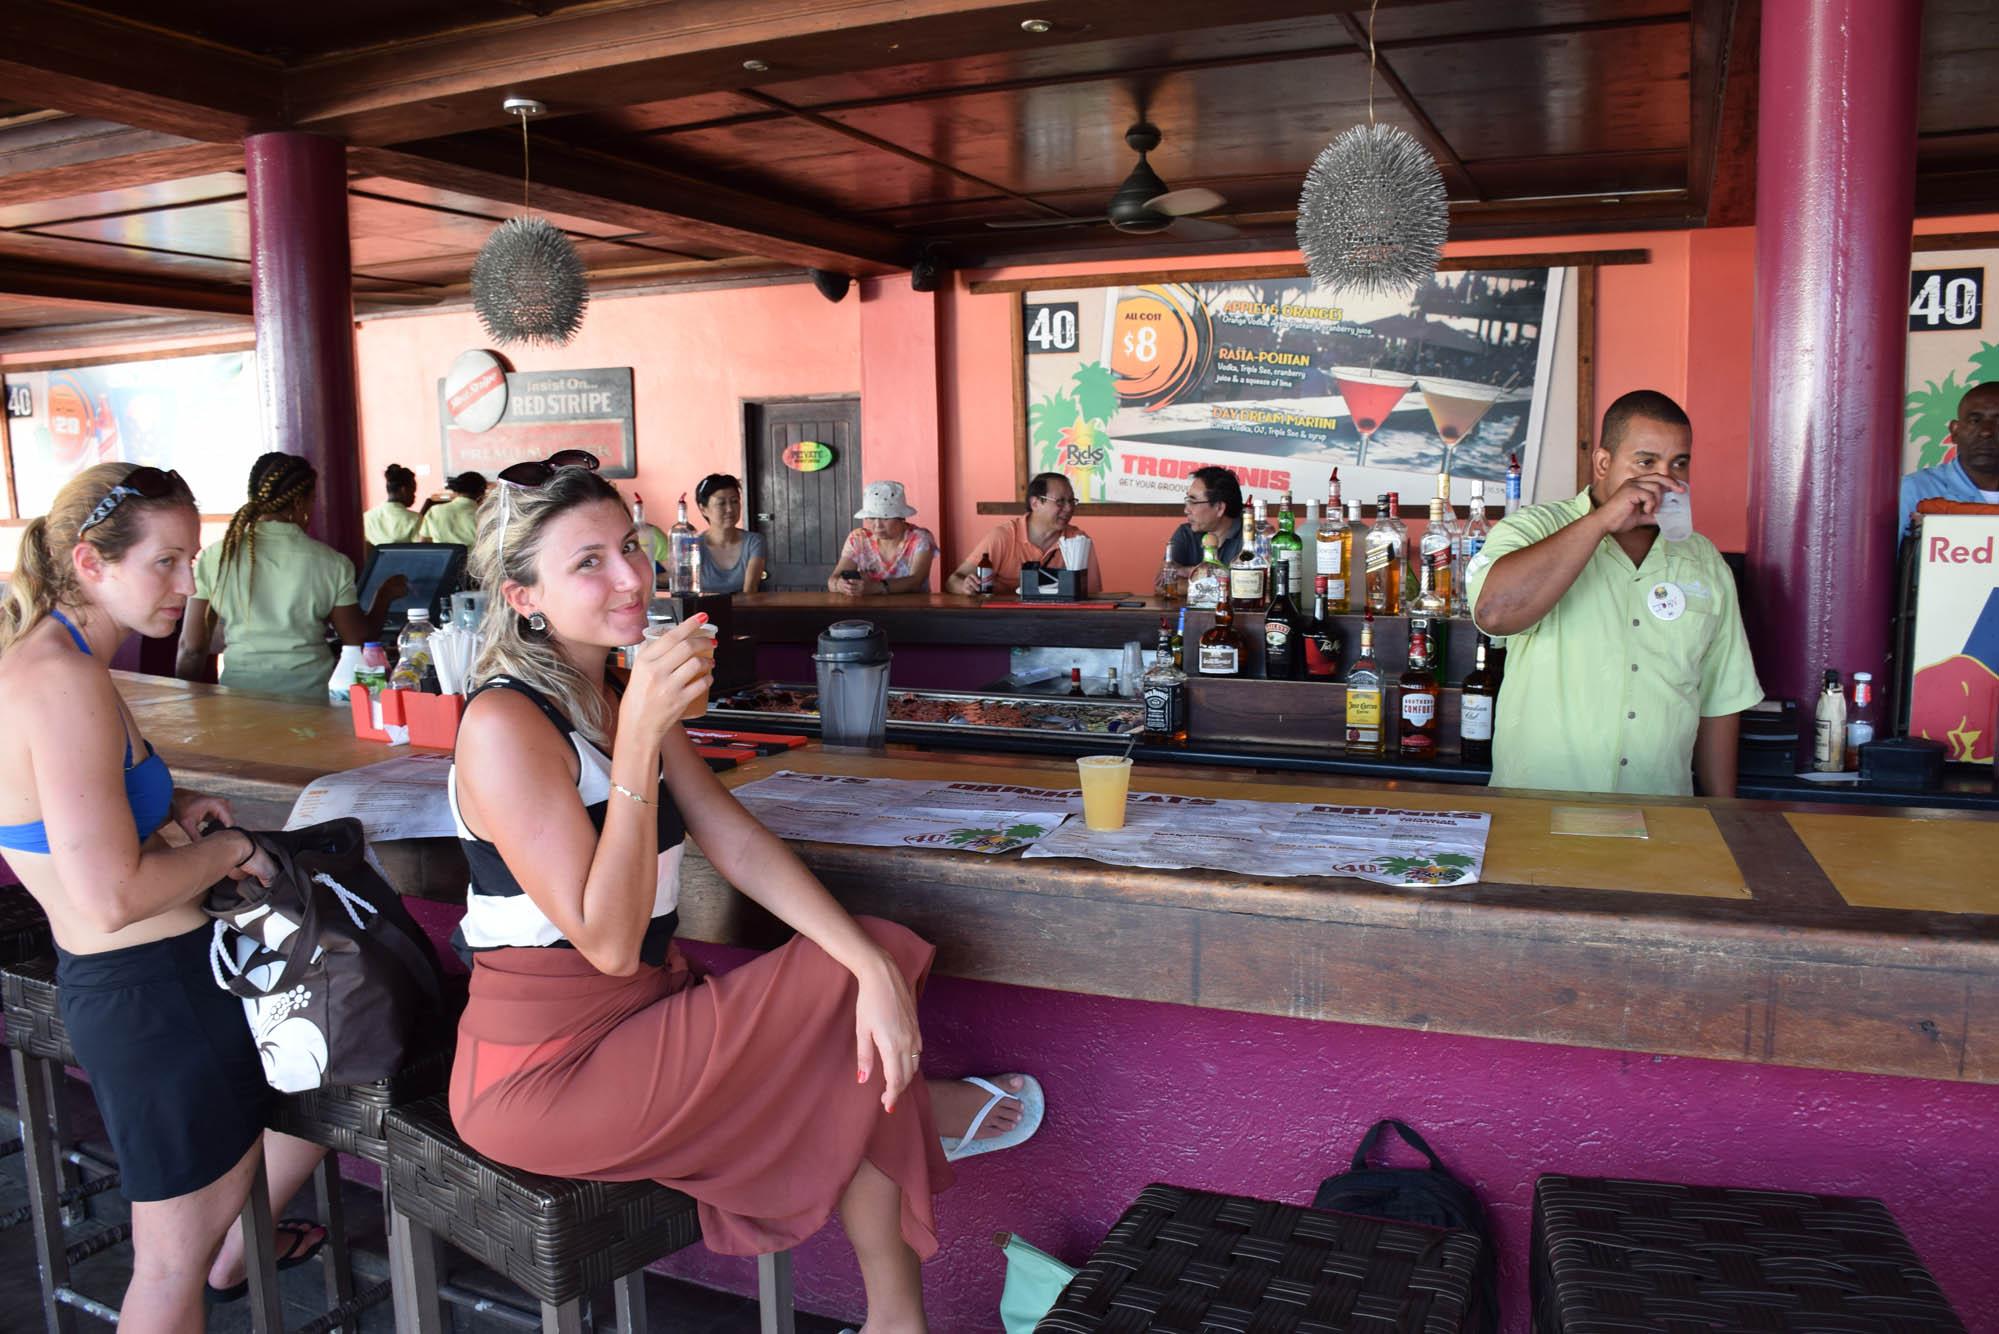 RICKS-CAFE-NEGRIL-JAMAICA-CLIFFS-JUMPING